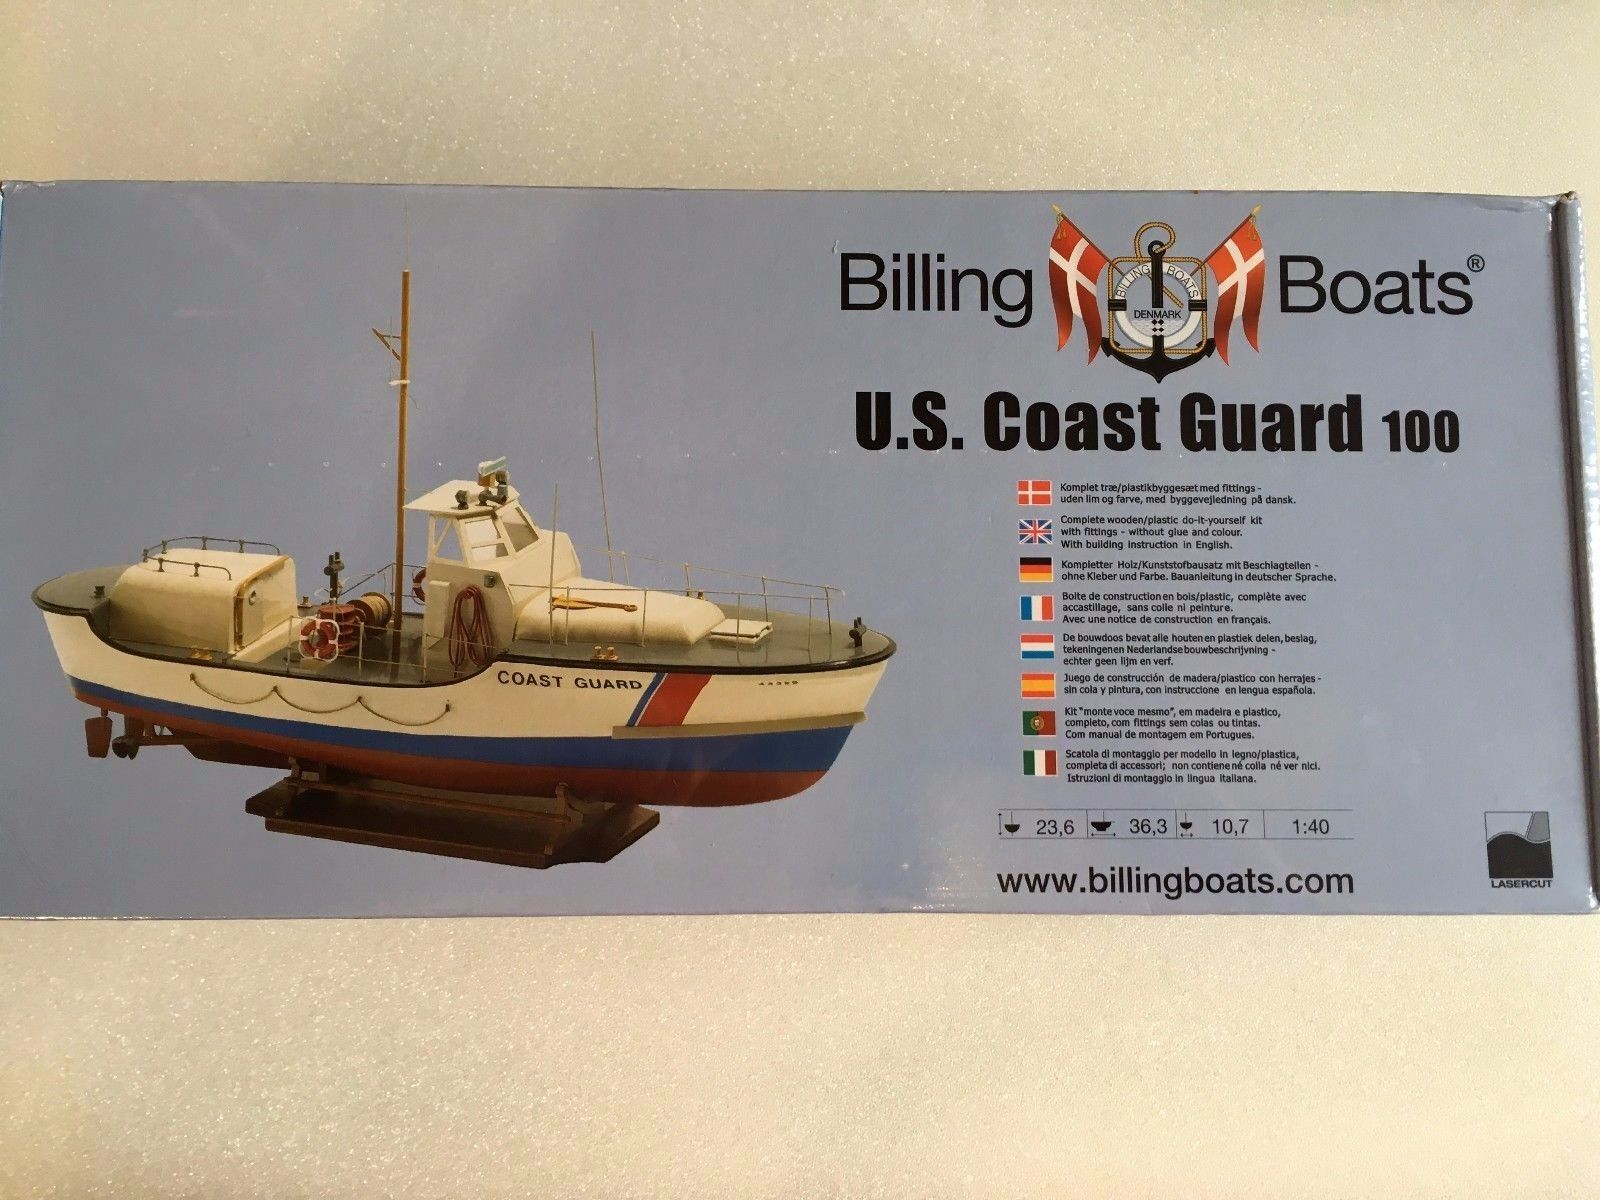 Billing Boats - B 100 - U.S.Coast Guard 100 Model Boat Kit 1 40 Scale T48 Post